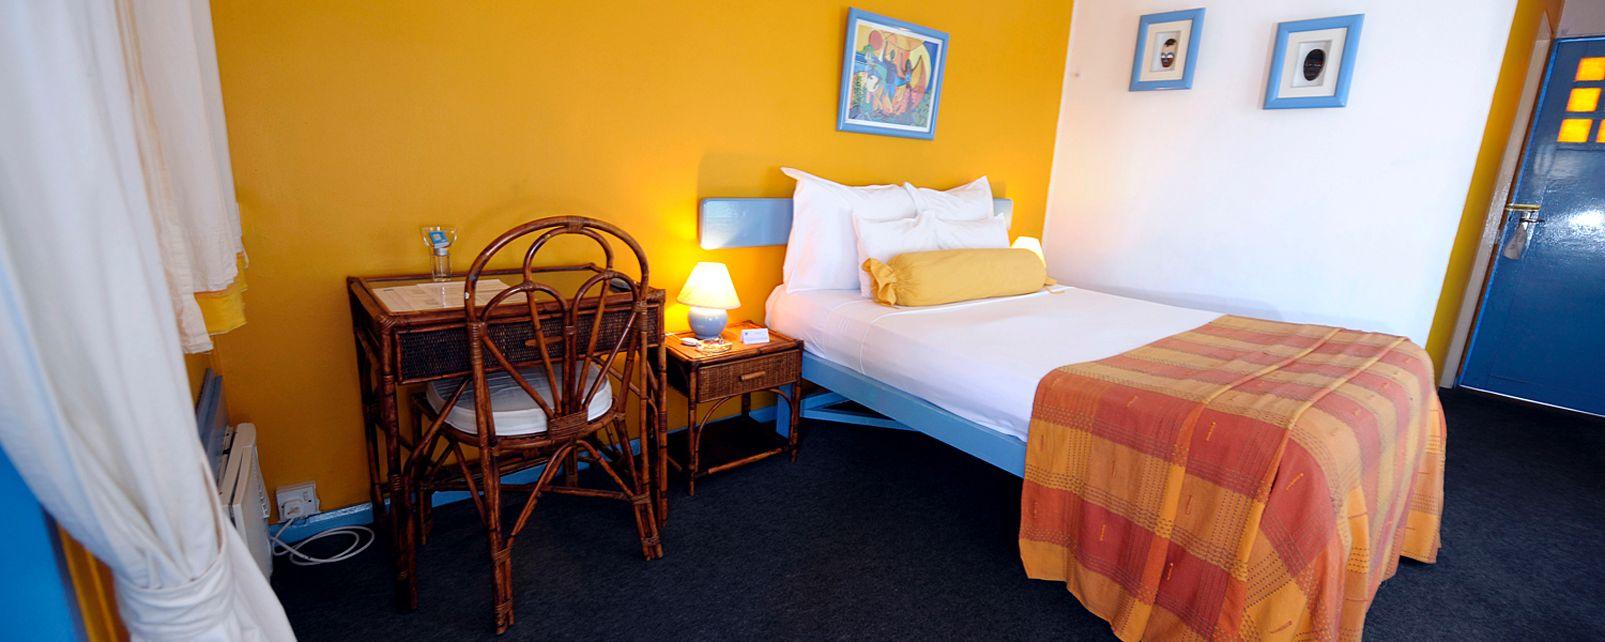 Hotel Ti Fleur Soleil